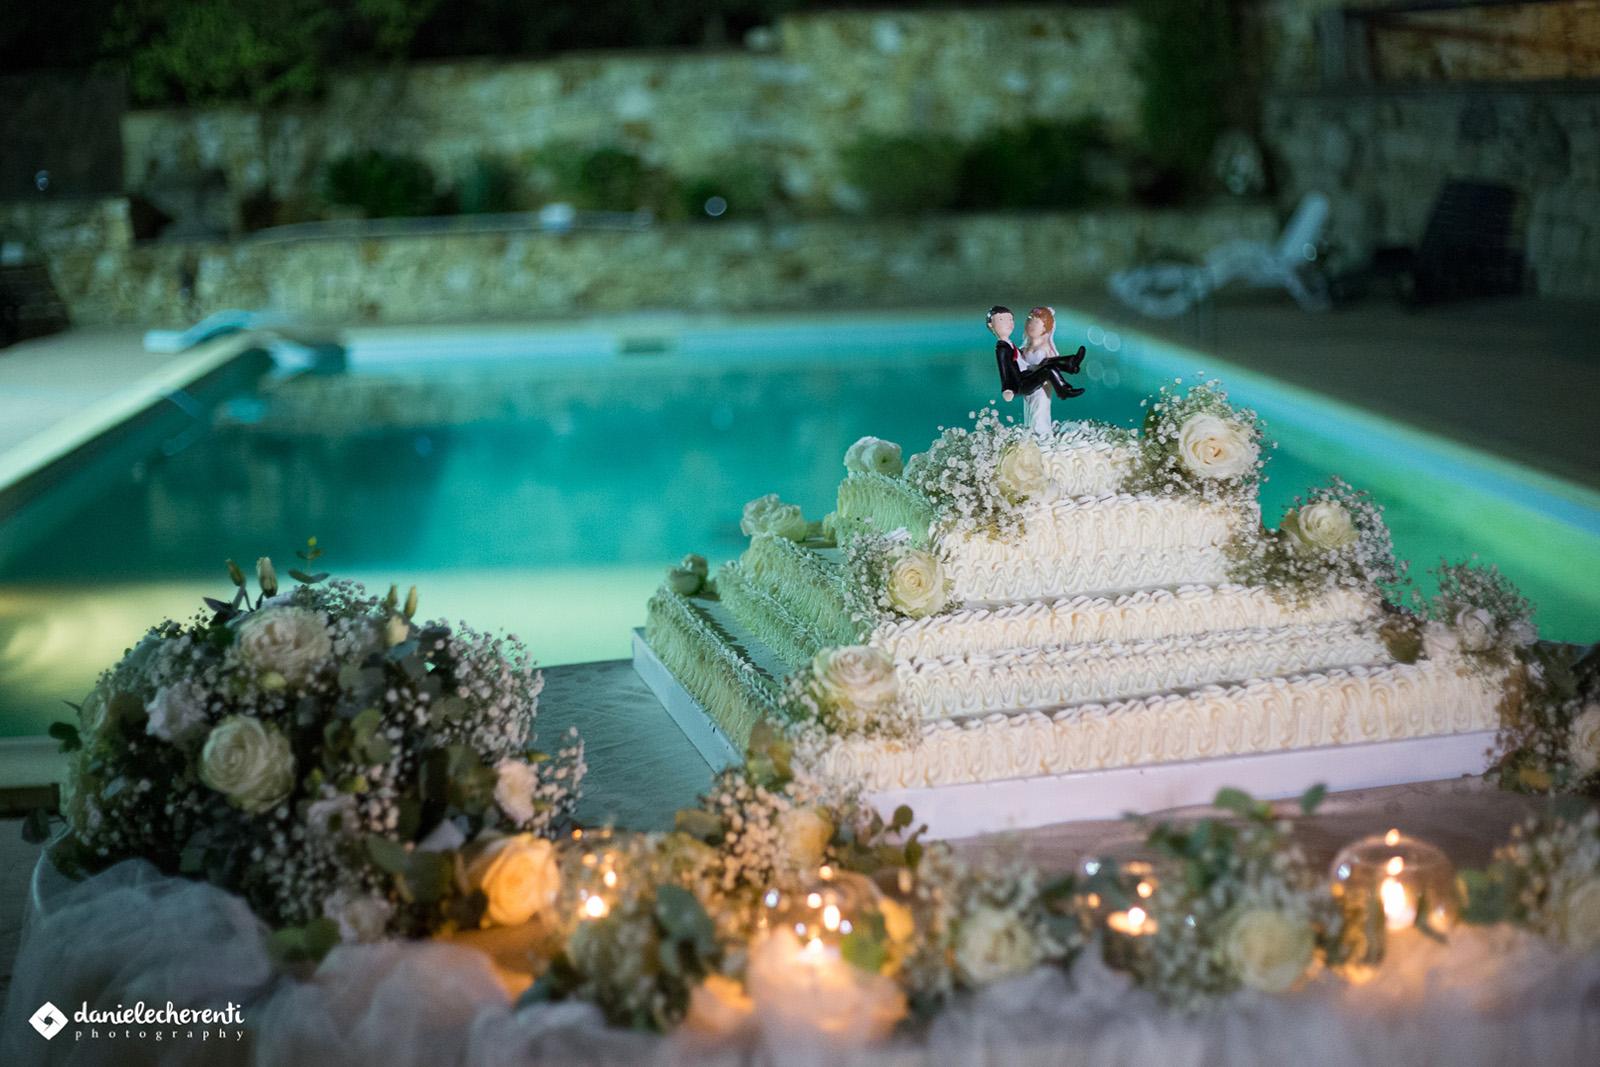 Torta Nuziale - Matrimonio a Carbonia - Ristorante Tanit - Ristorante a Carbonia dal 1981 - 4